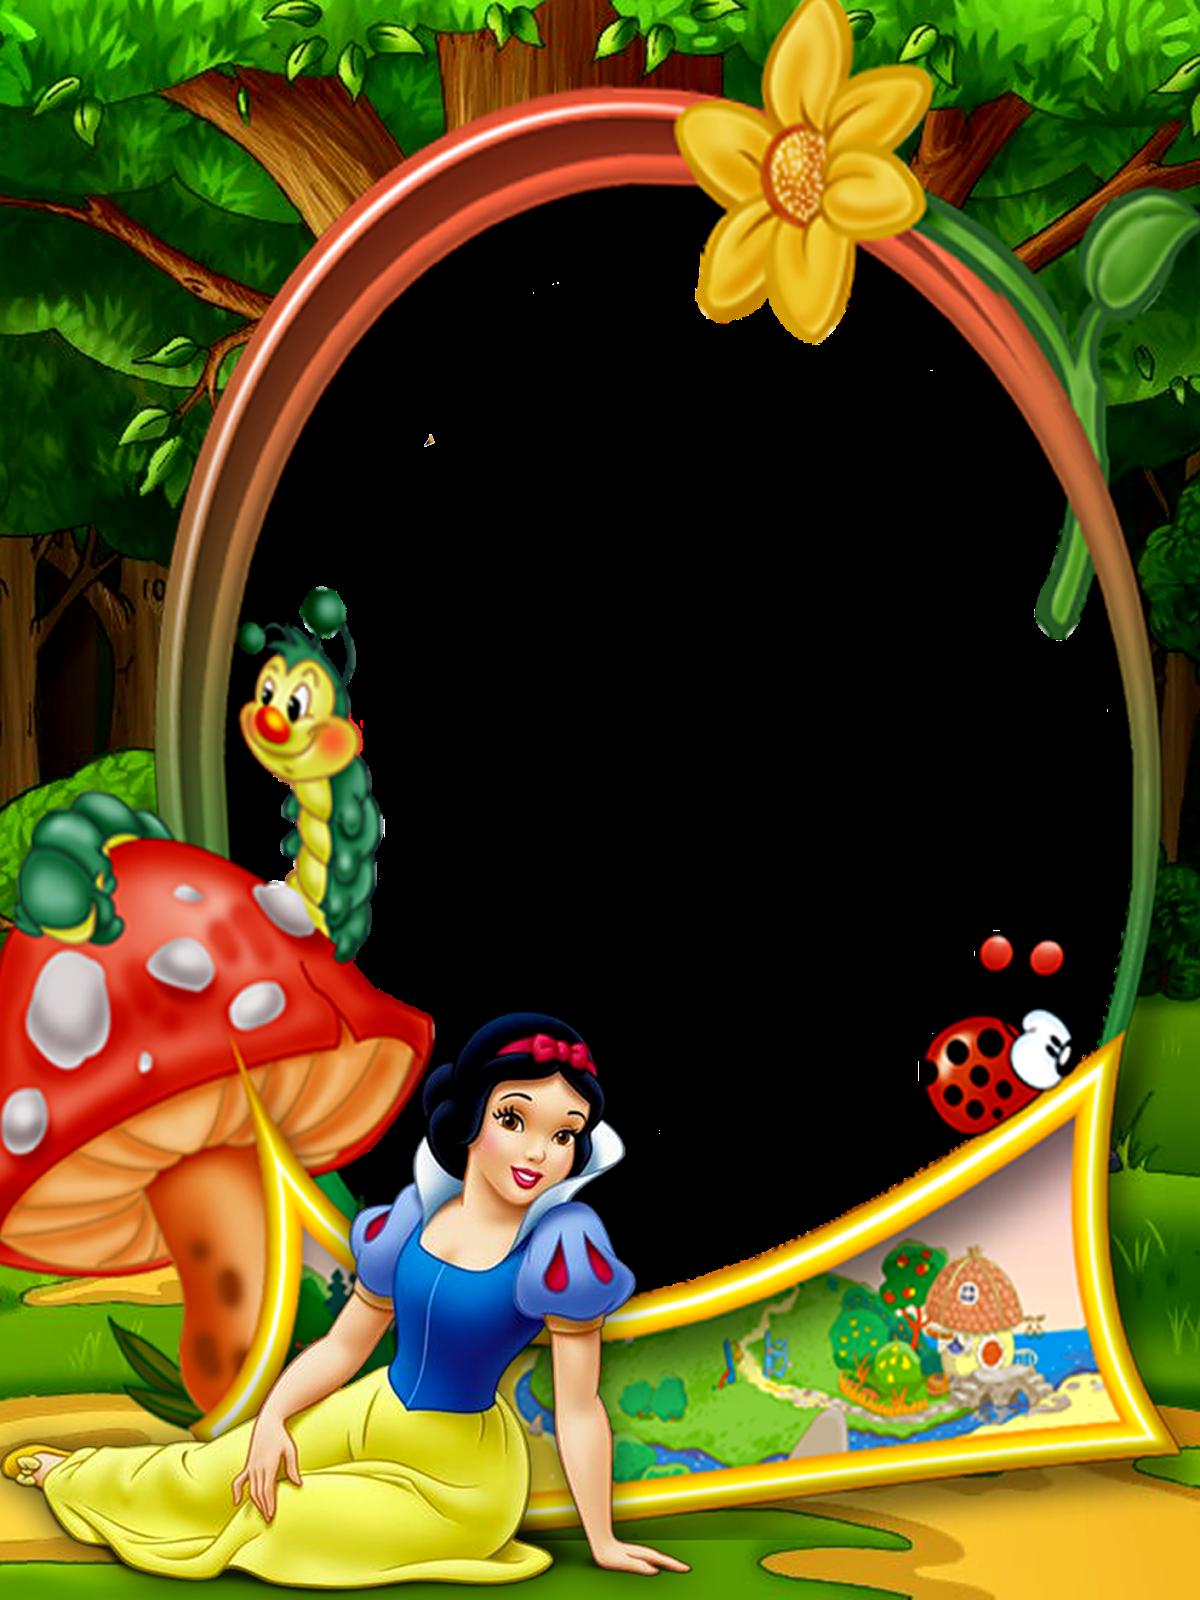 Pin De Lisa Naulapwa Em Disney Land Convite Branca De Neve Scrapbook Da Disney Fotos Branca De Neve